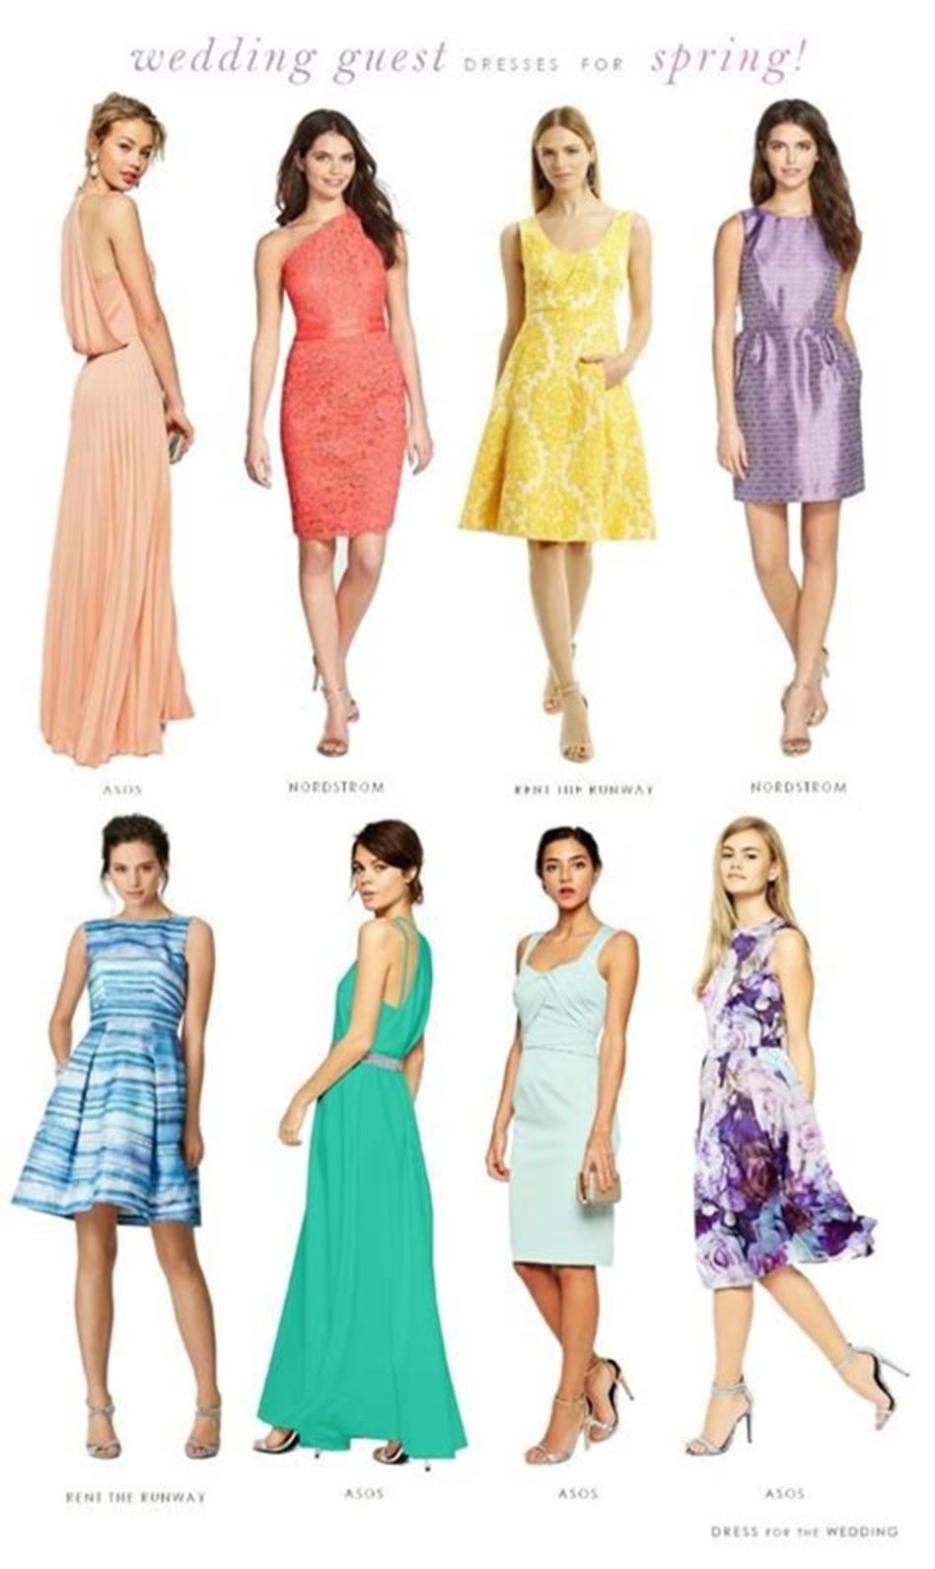 35 Cute Spring Wedding Guest Dresses Ideas Trueclothes Guest Attire Spring Wedding Guest Attire Wedding Attire Guest